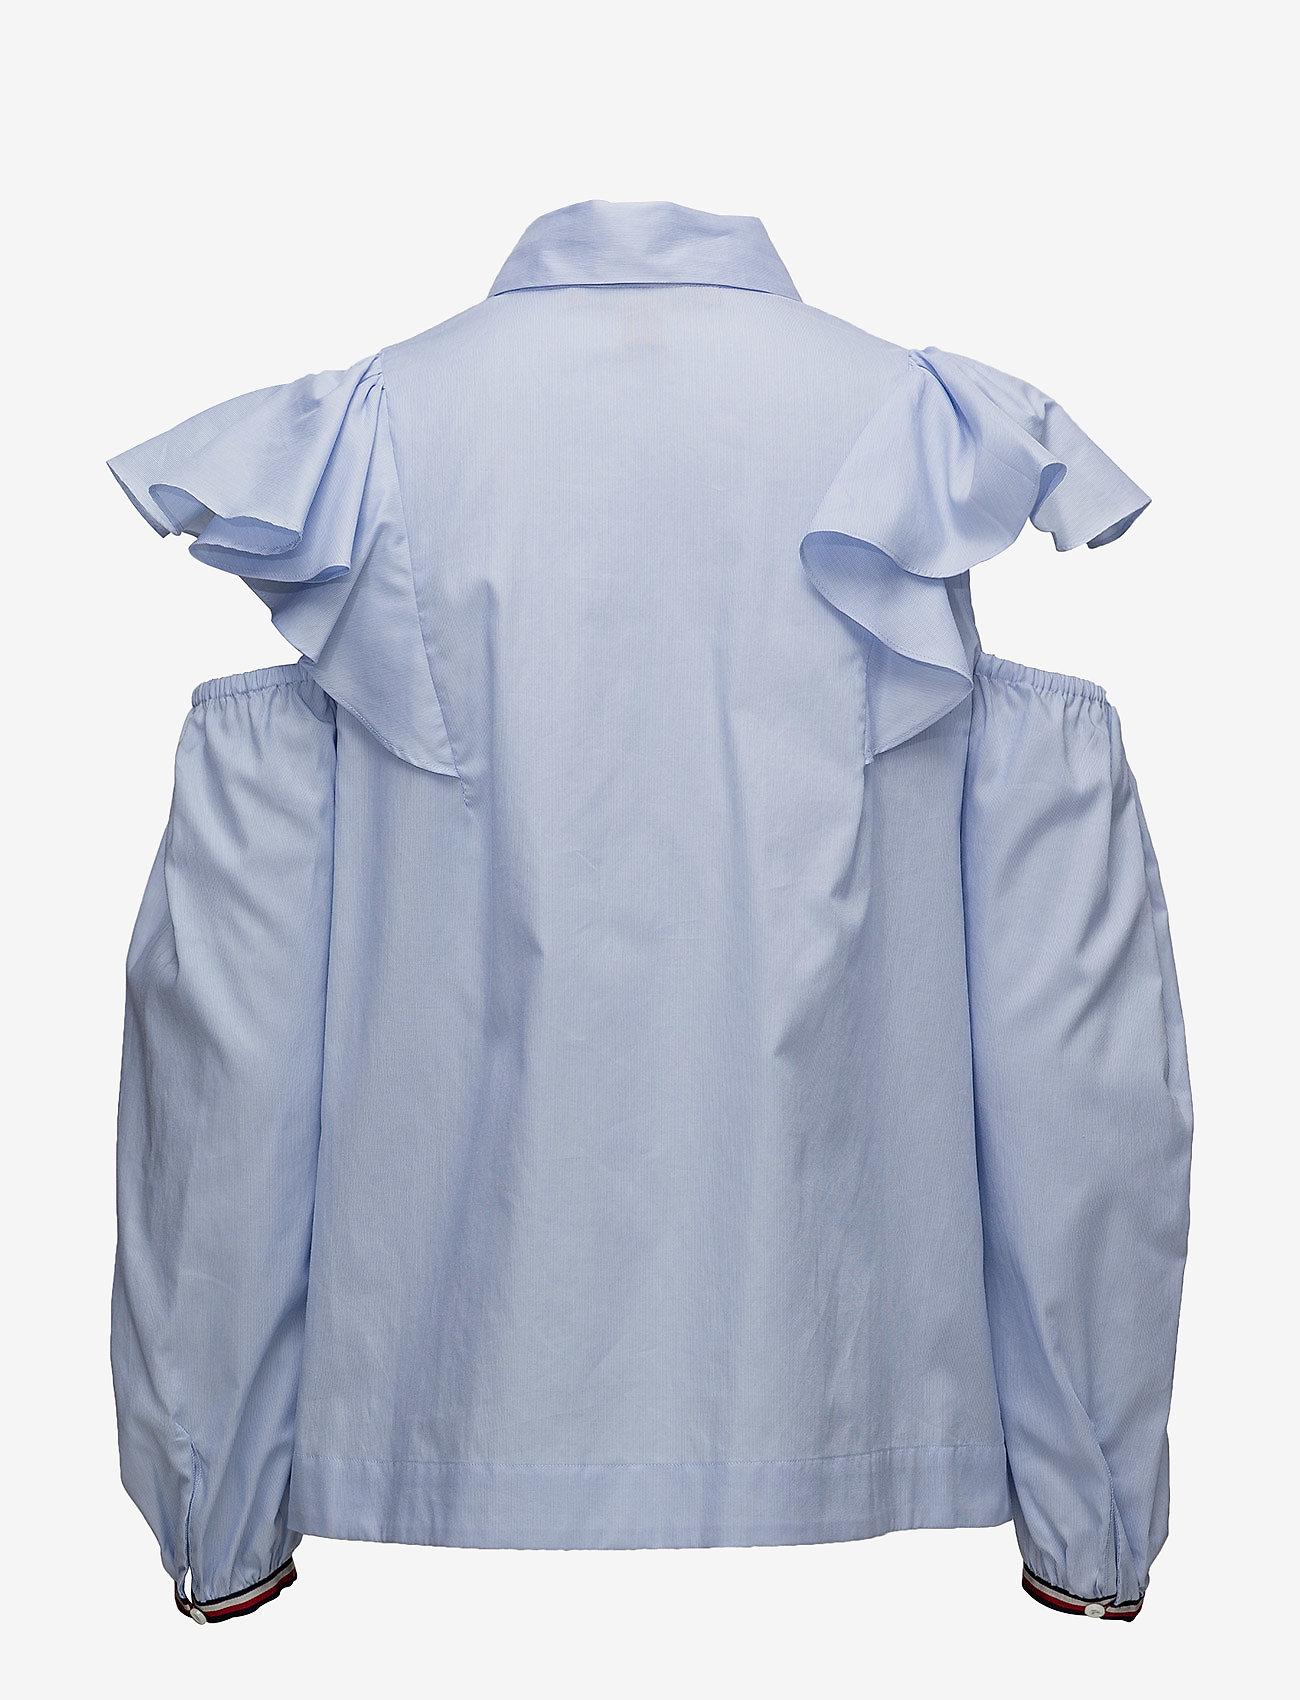 Hilfiger Collection - FEMININE SHIRT LS - long sleeved blouses - heather